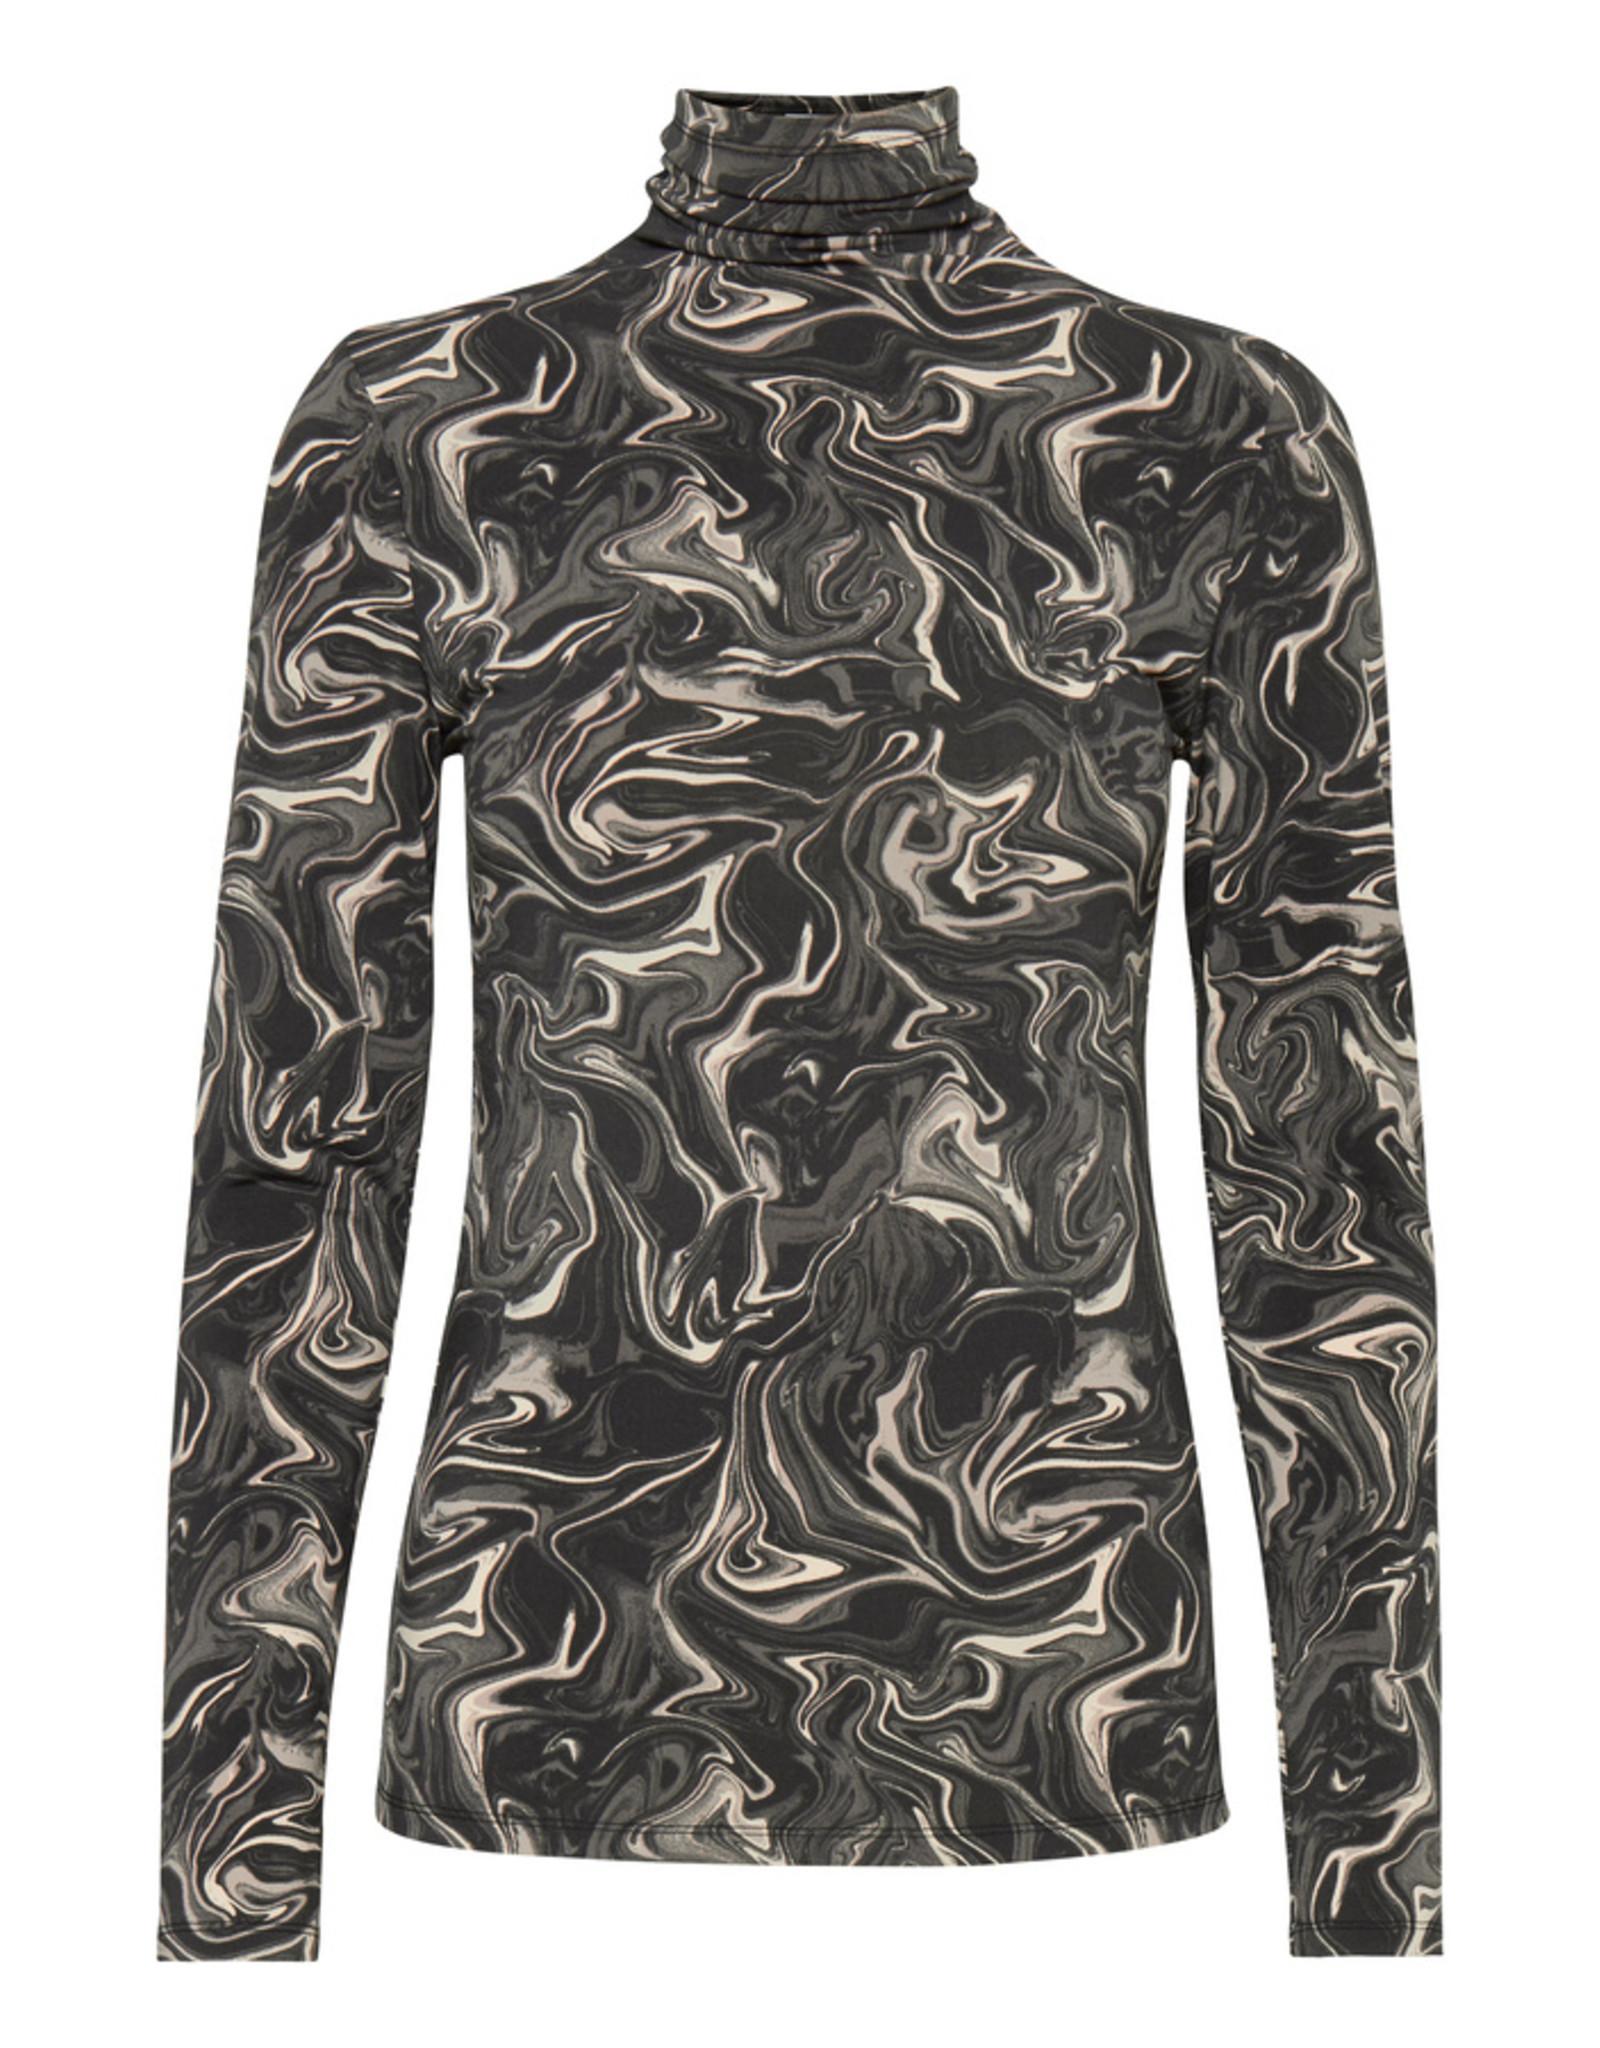 ICHI Long Sleeved Asphalt Top